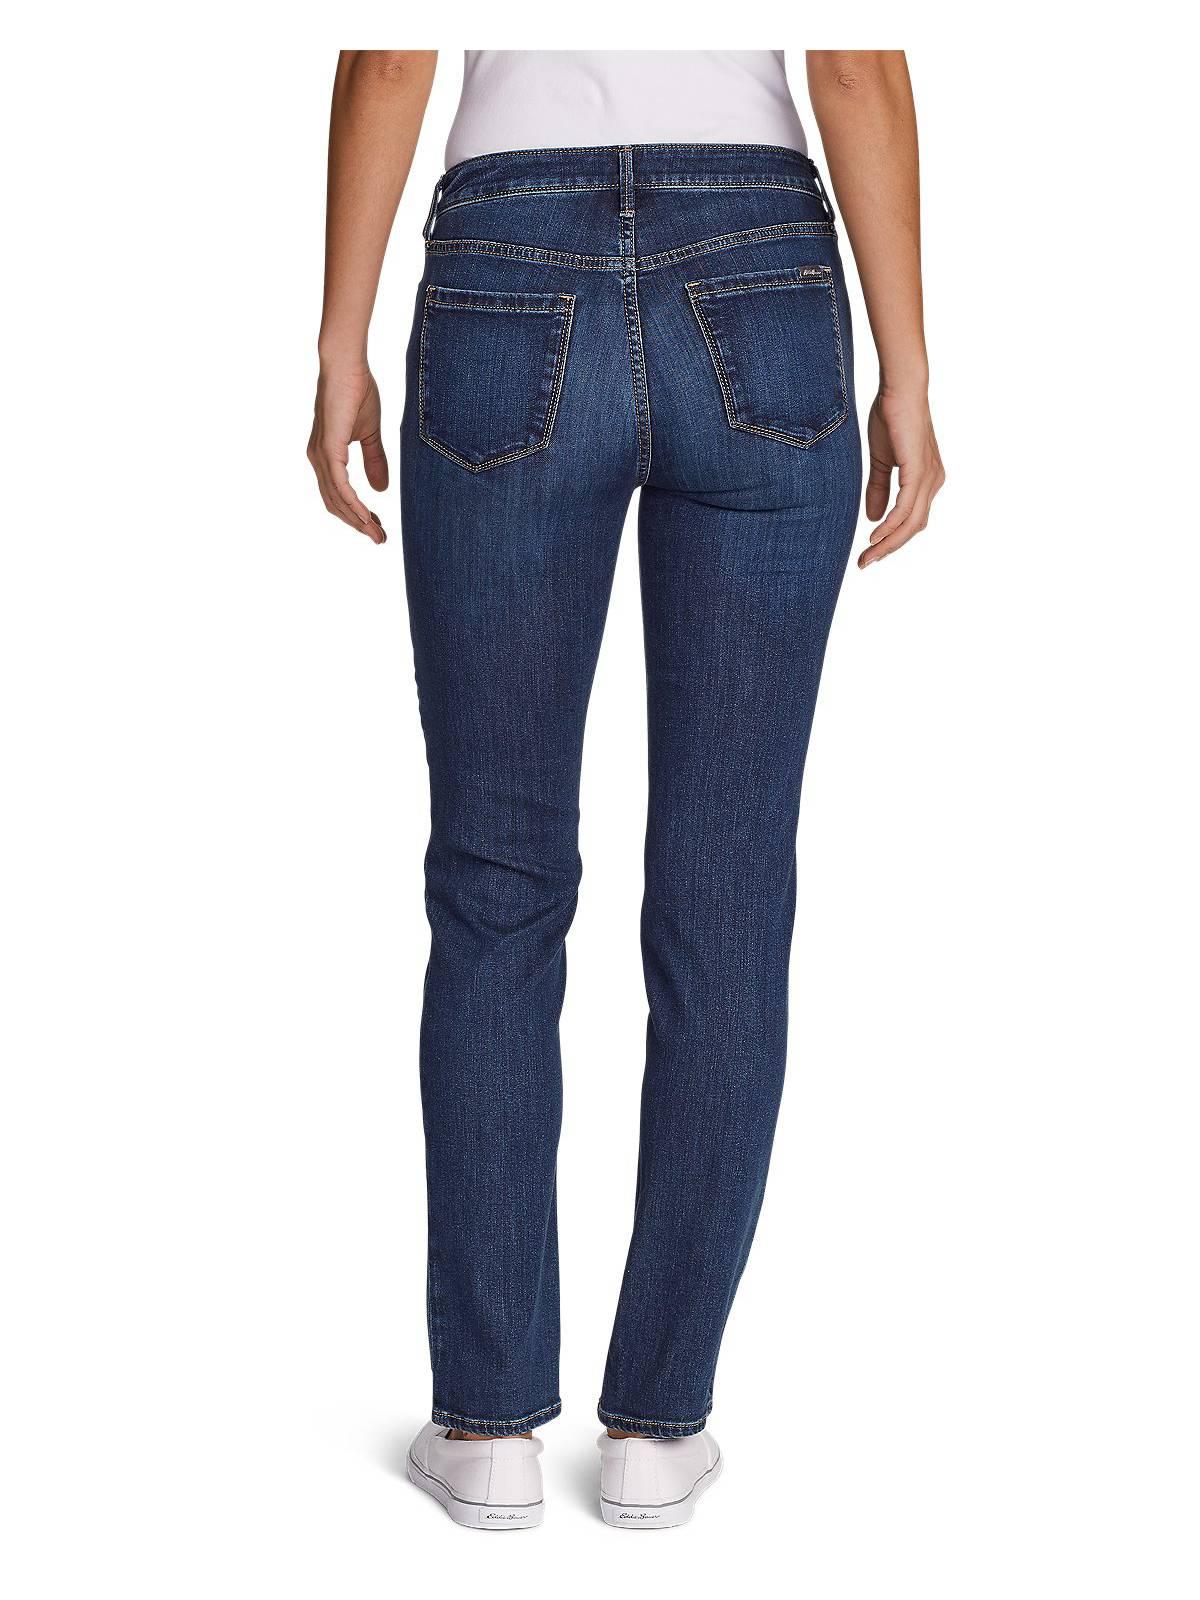 Eddie-Bauer-Women-039-s-Elysian-Slim-Straight-High-Rise-Jeans thumbnail 3